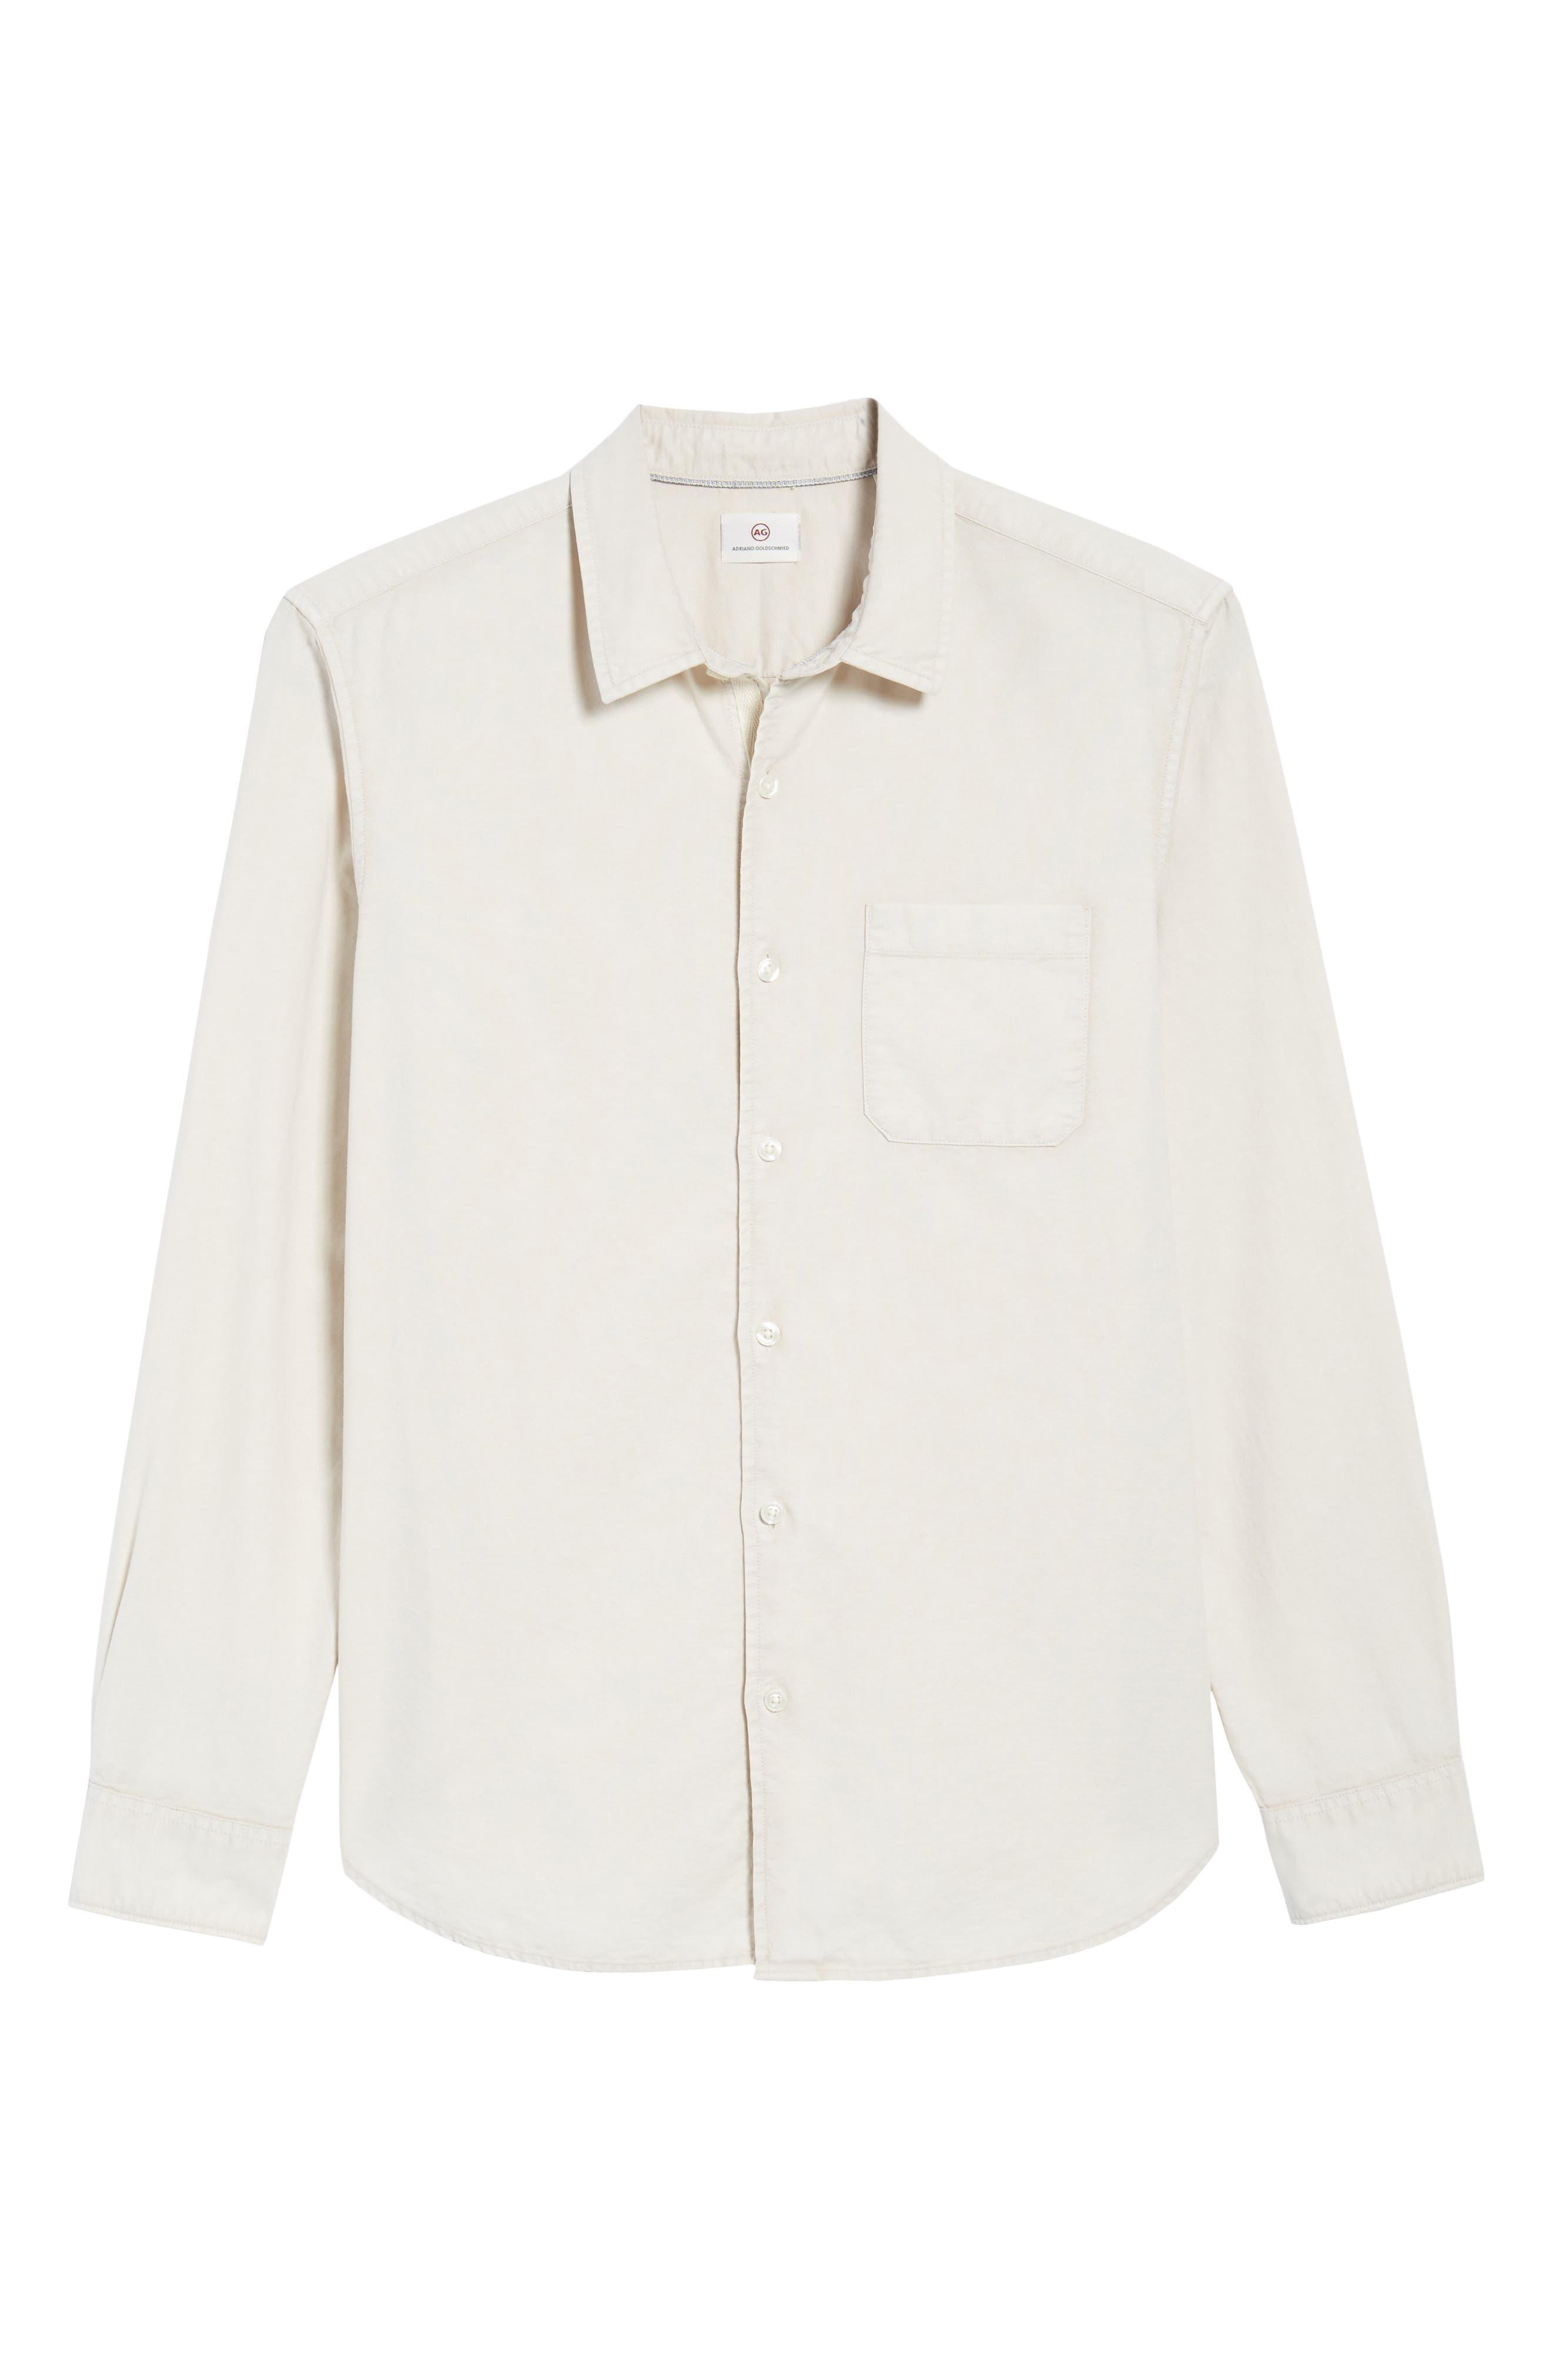 Bristol Slim Fit Sport Shirt,                             Alternate thumbnail 6, color,                             Sunbaked Mineral Veil